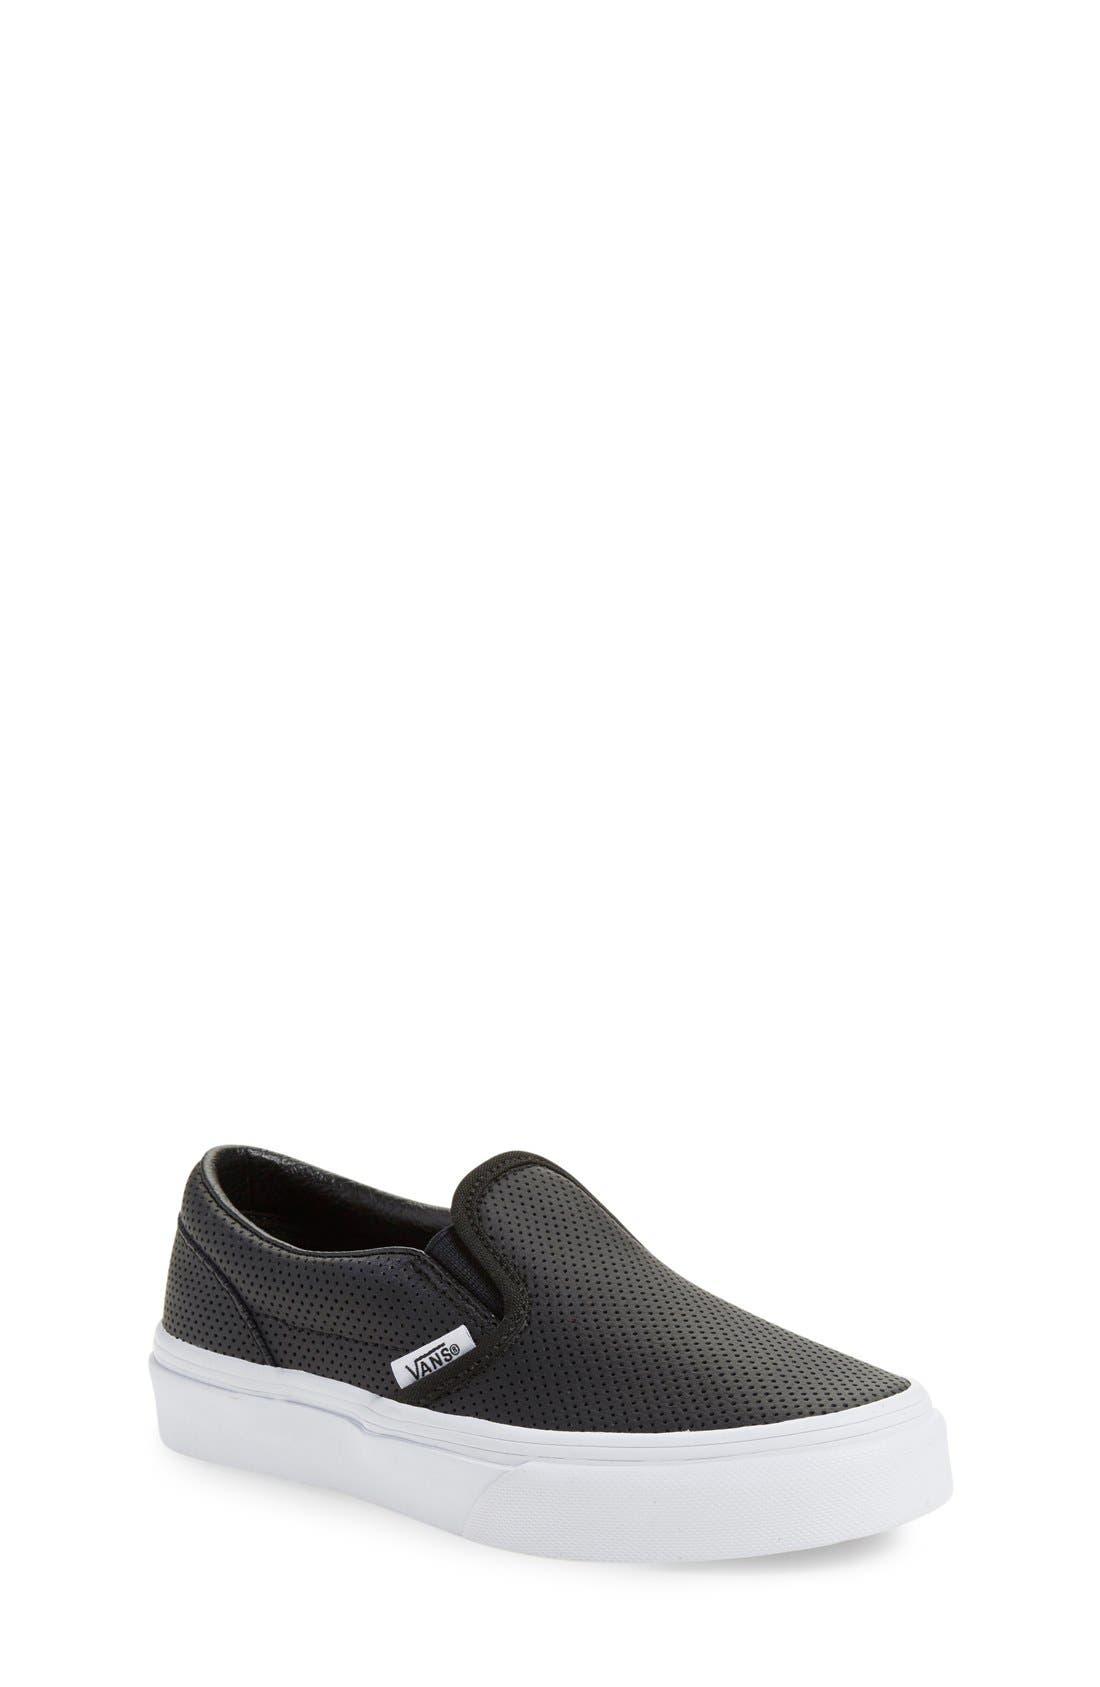 Vans 'Classic' Slip-On Sneaker (Baby, Walker, Toddler, Little Kid & Big Kid)